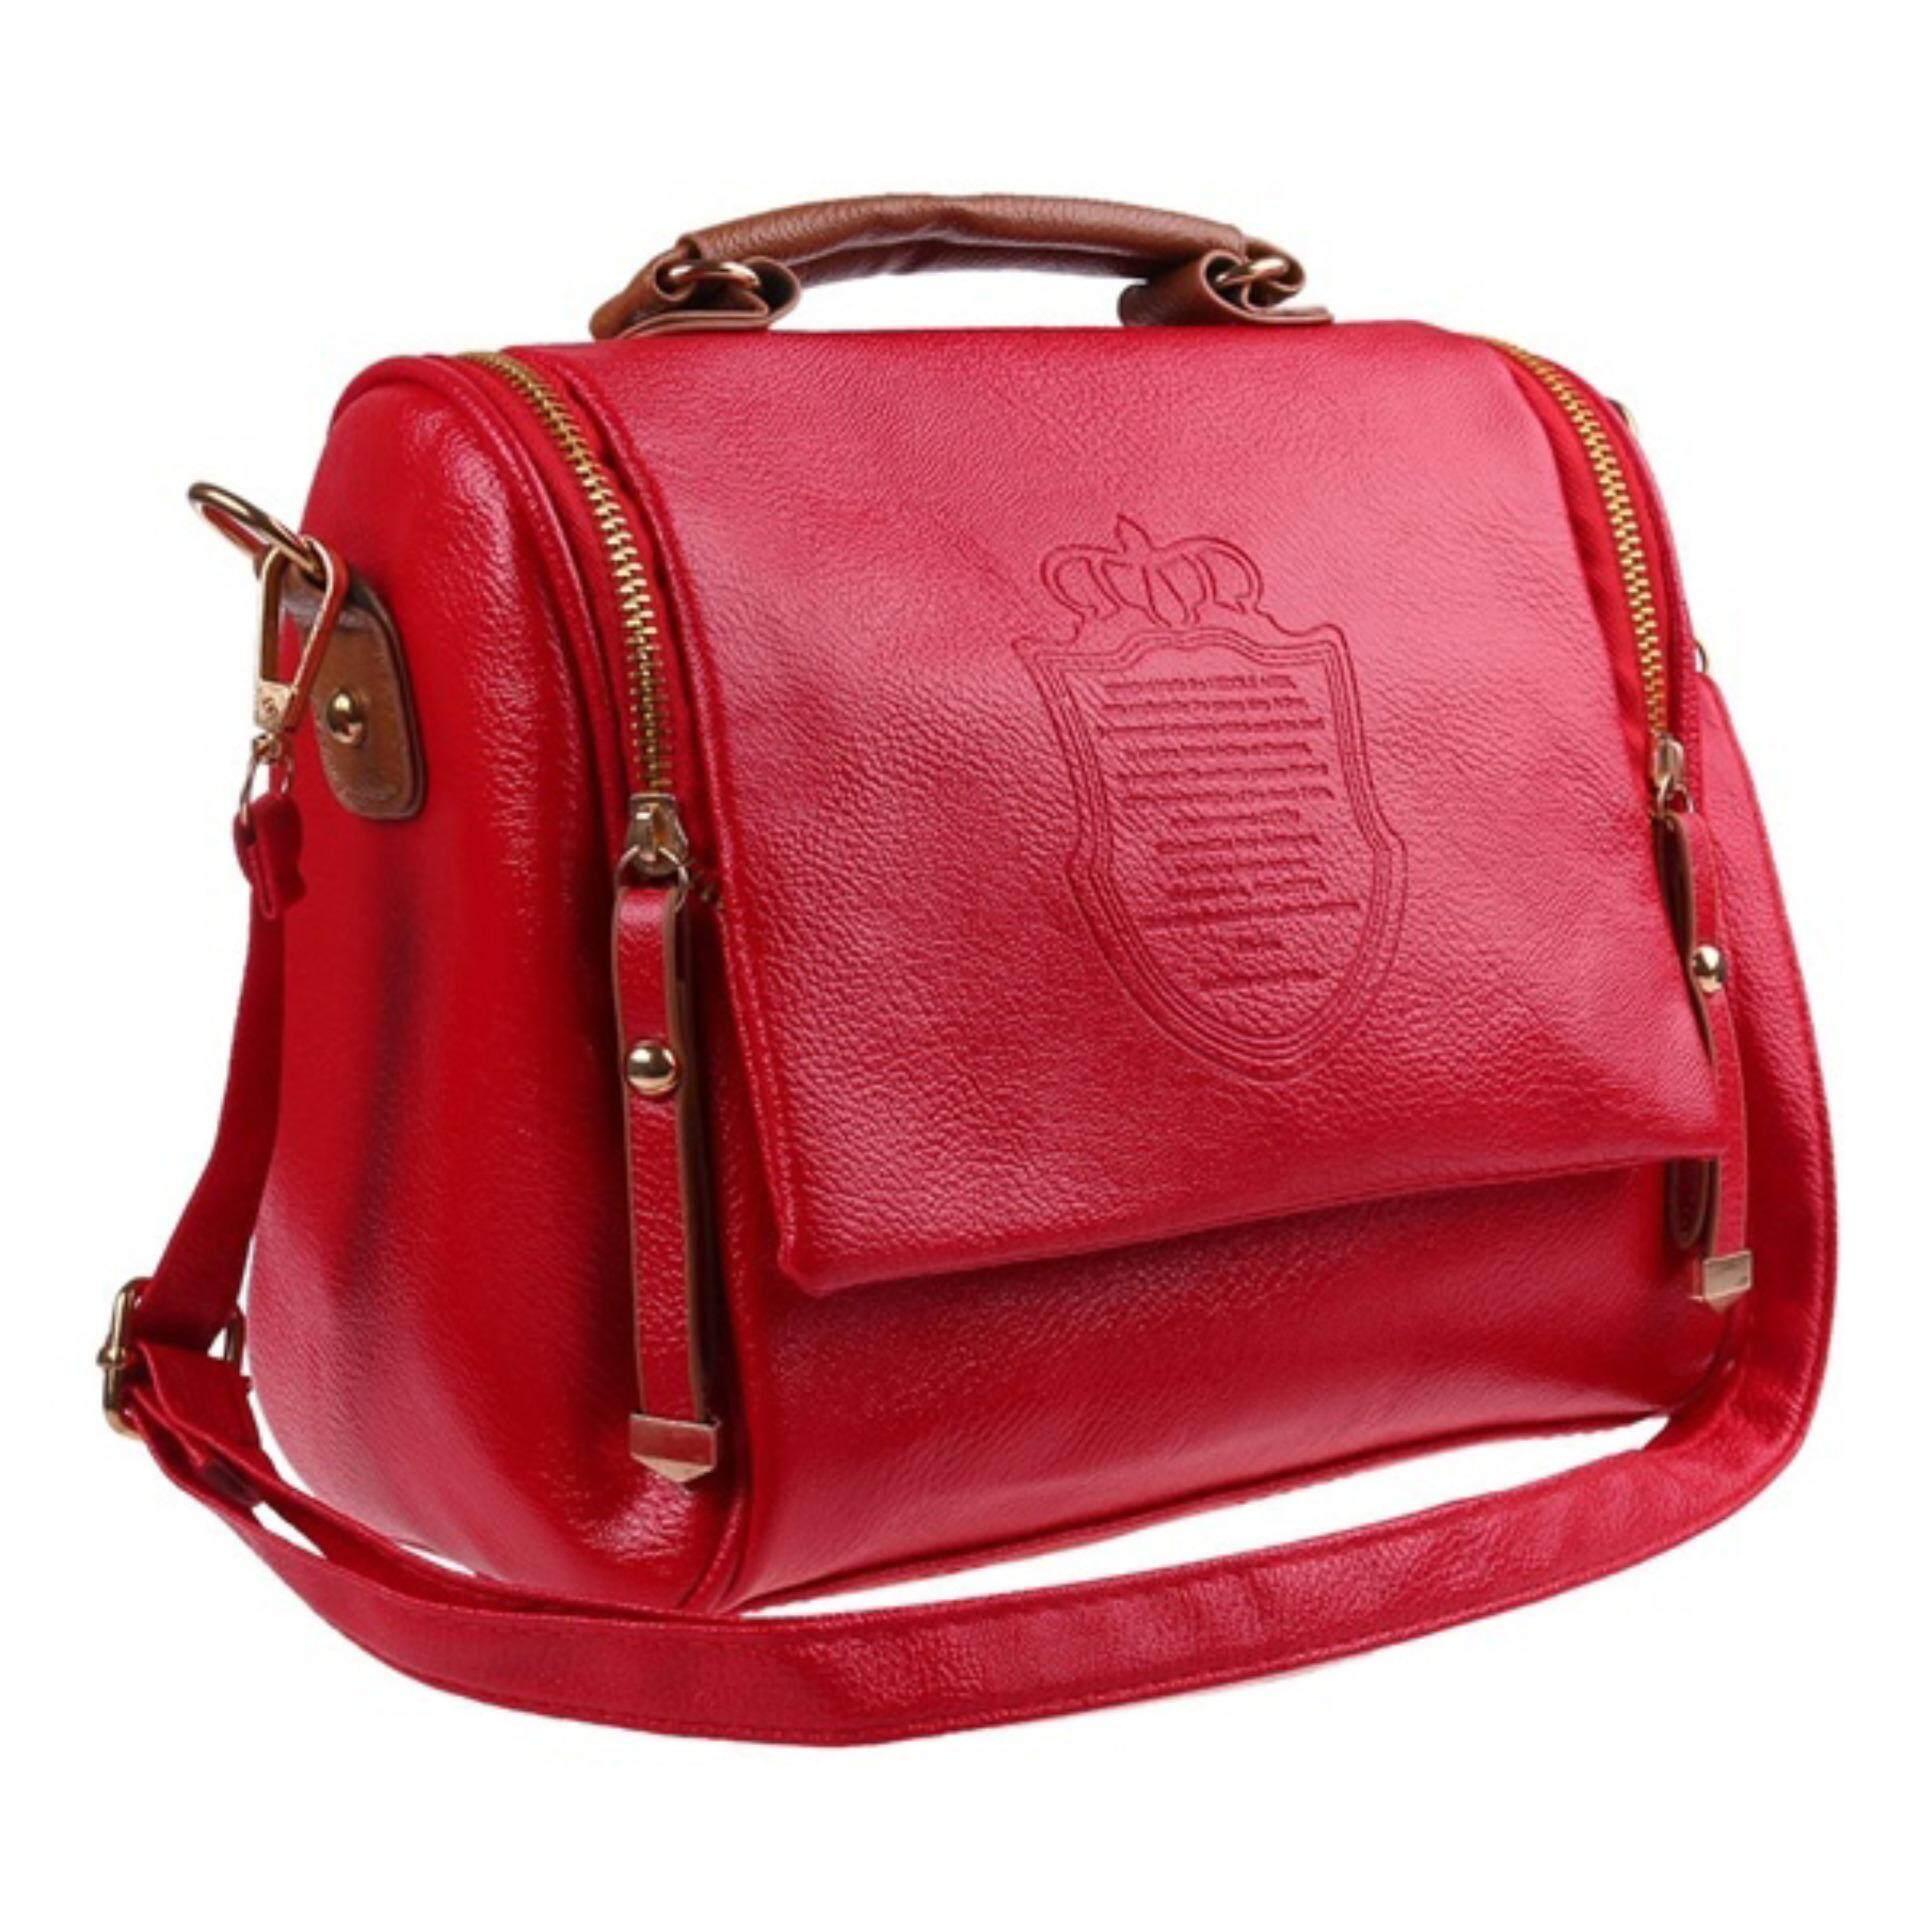 Kingdom Crown PU Leather Women Briefcase Style Handbag Shoulder Bag Passion Red